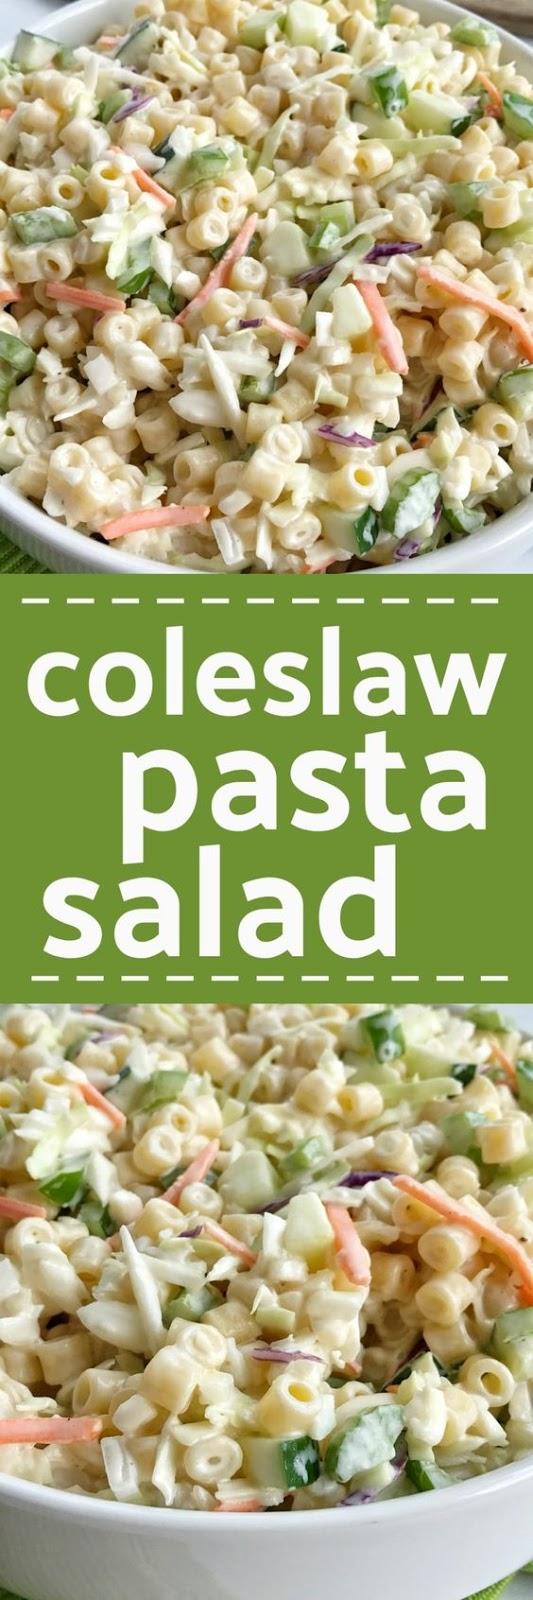 Coleslaw Pasta Salad Recipe